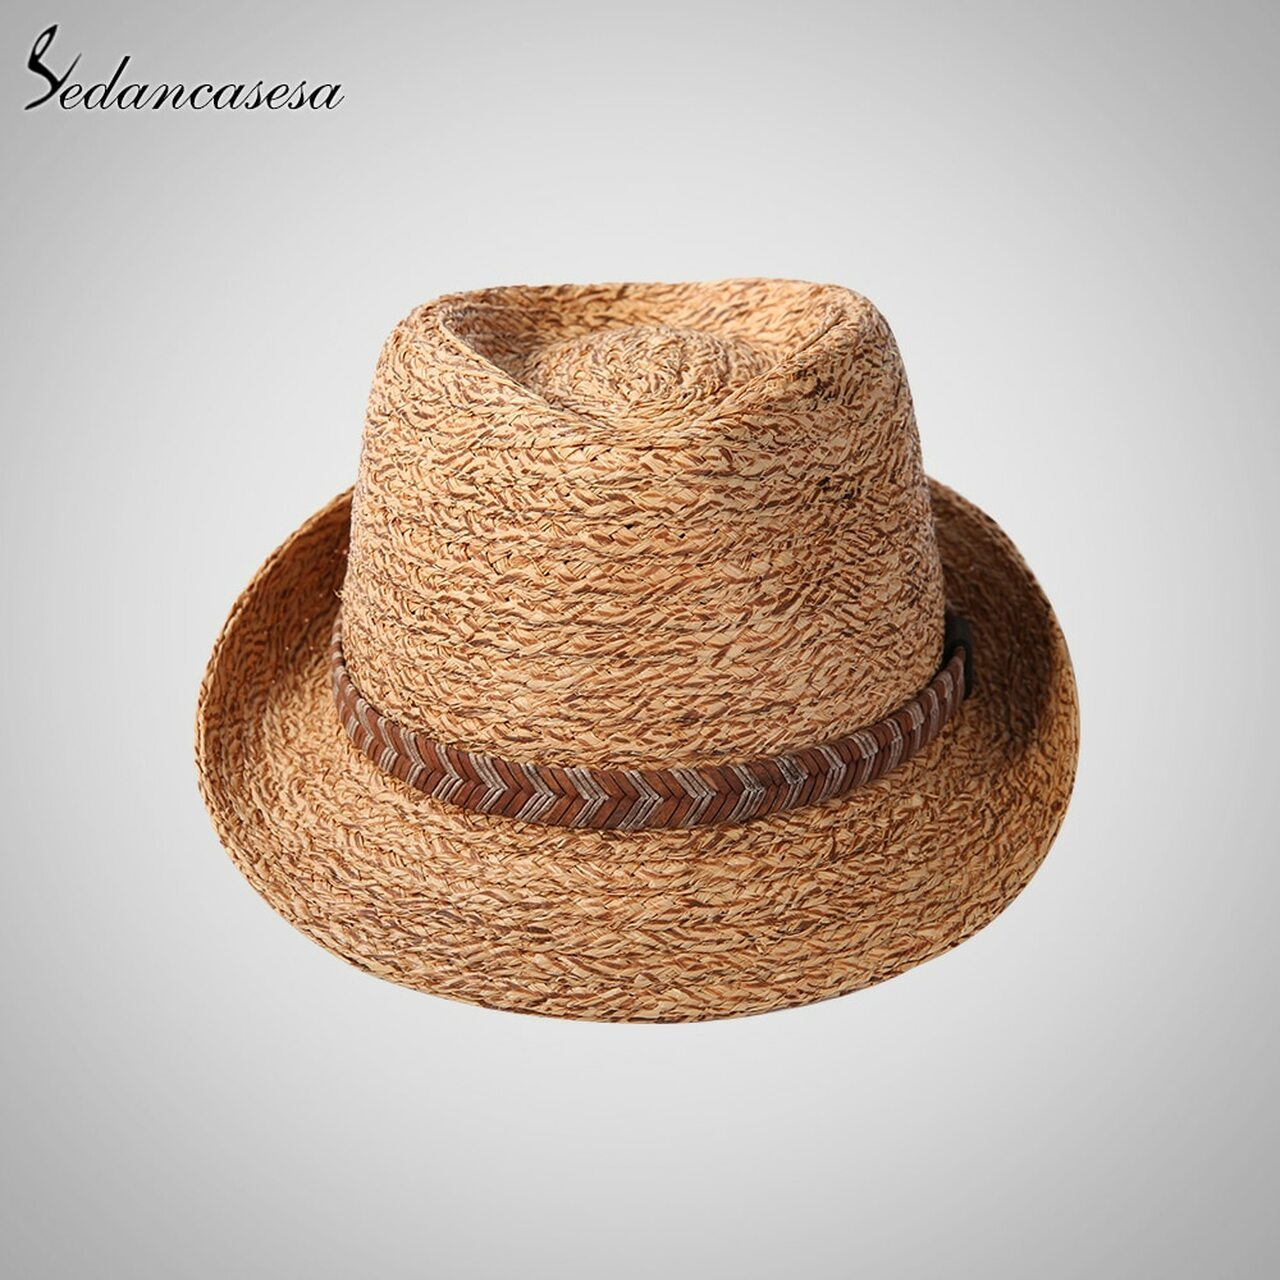 dac0d7f5 ... Sedancasesa Raffia Straw Fedora Hat Male Classic Summer Beach Trilby Sun  Hats For Men Women UV ...